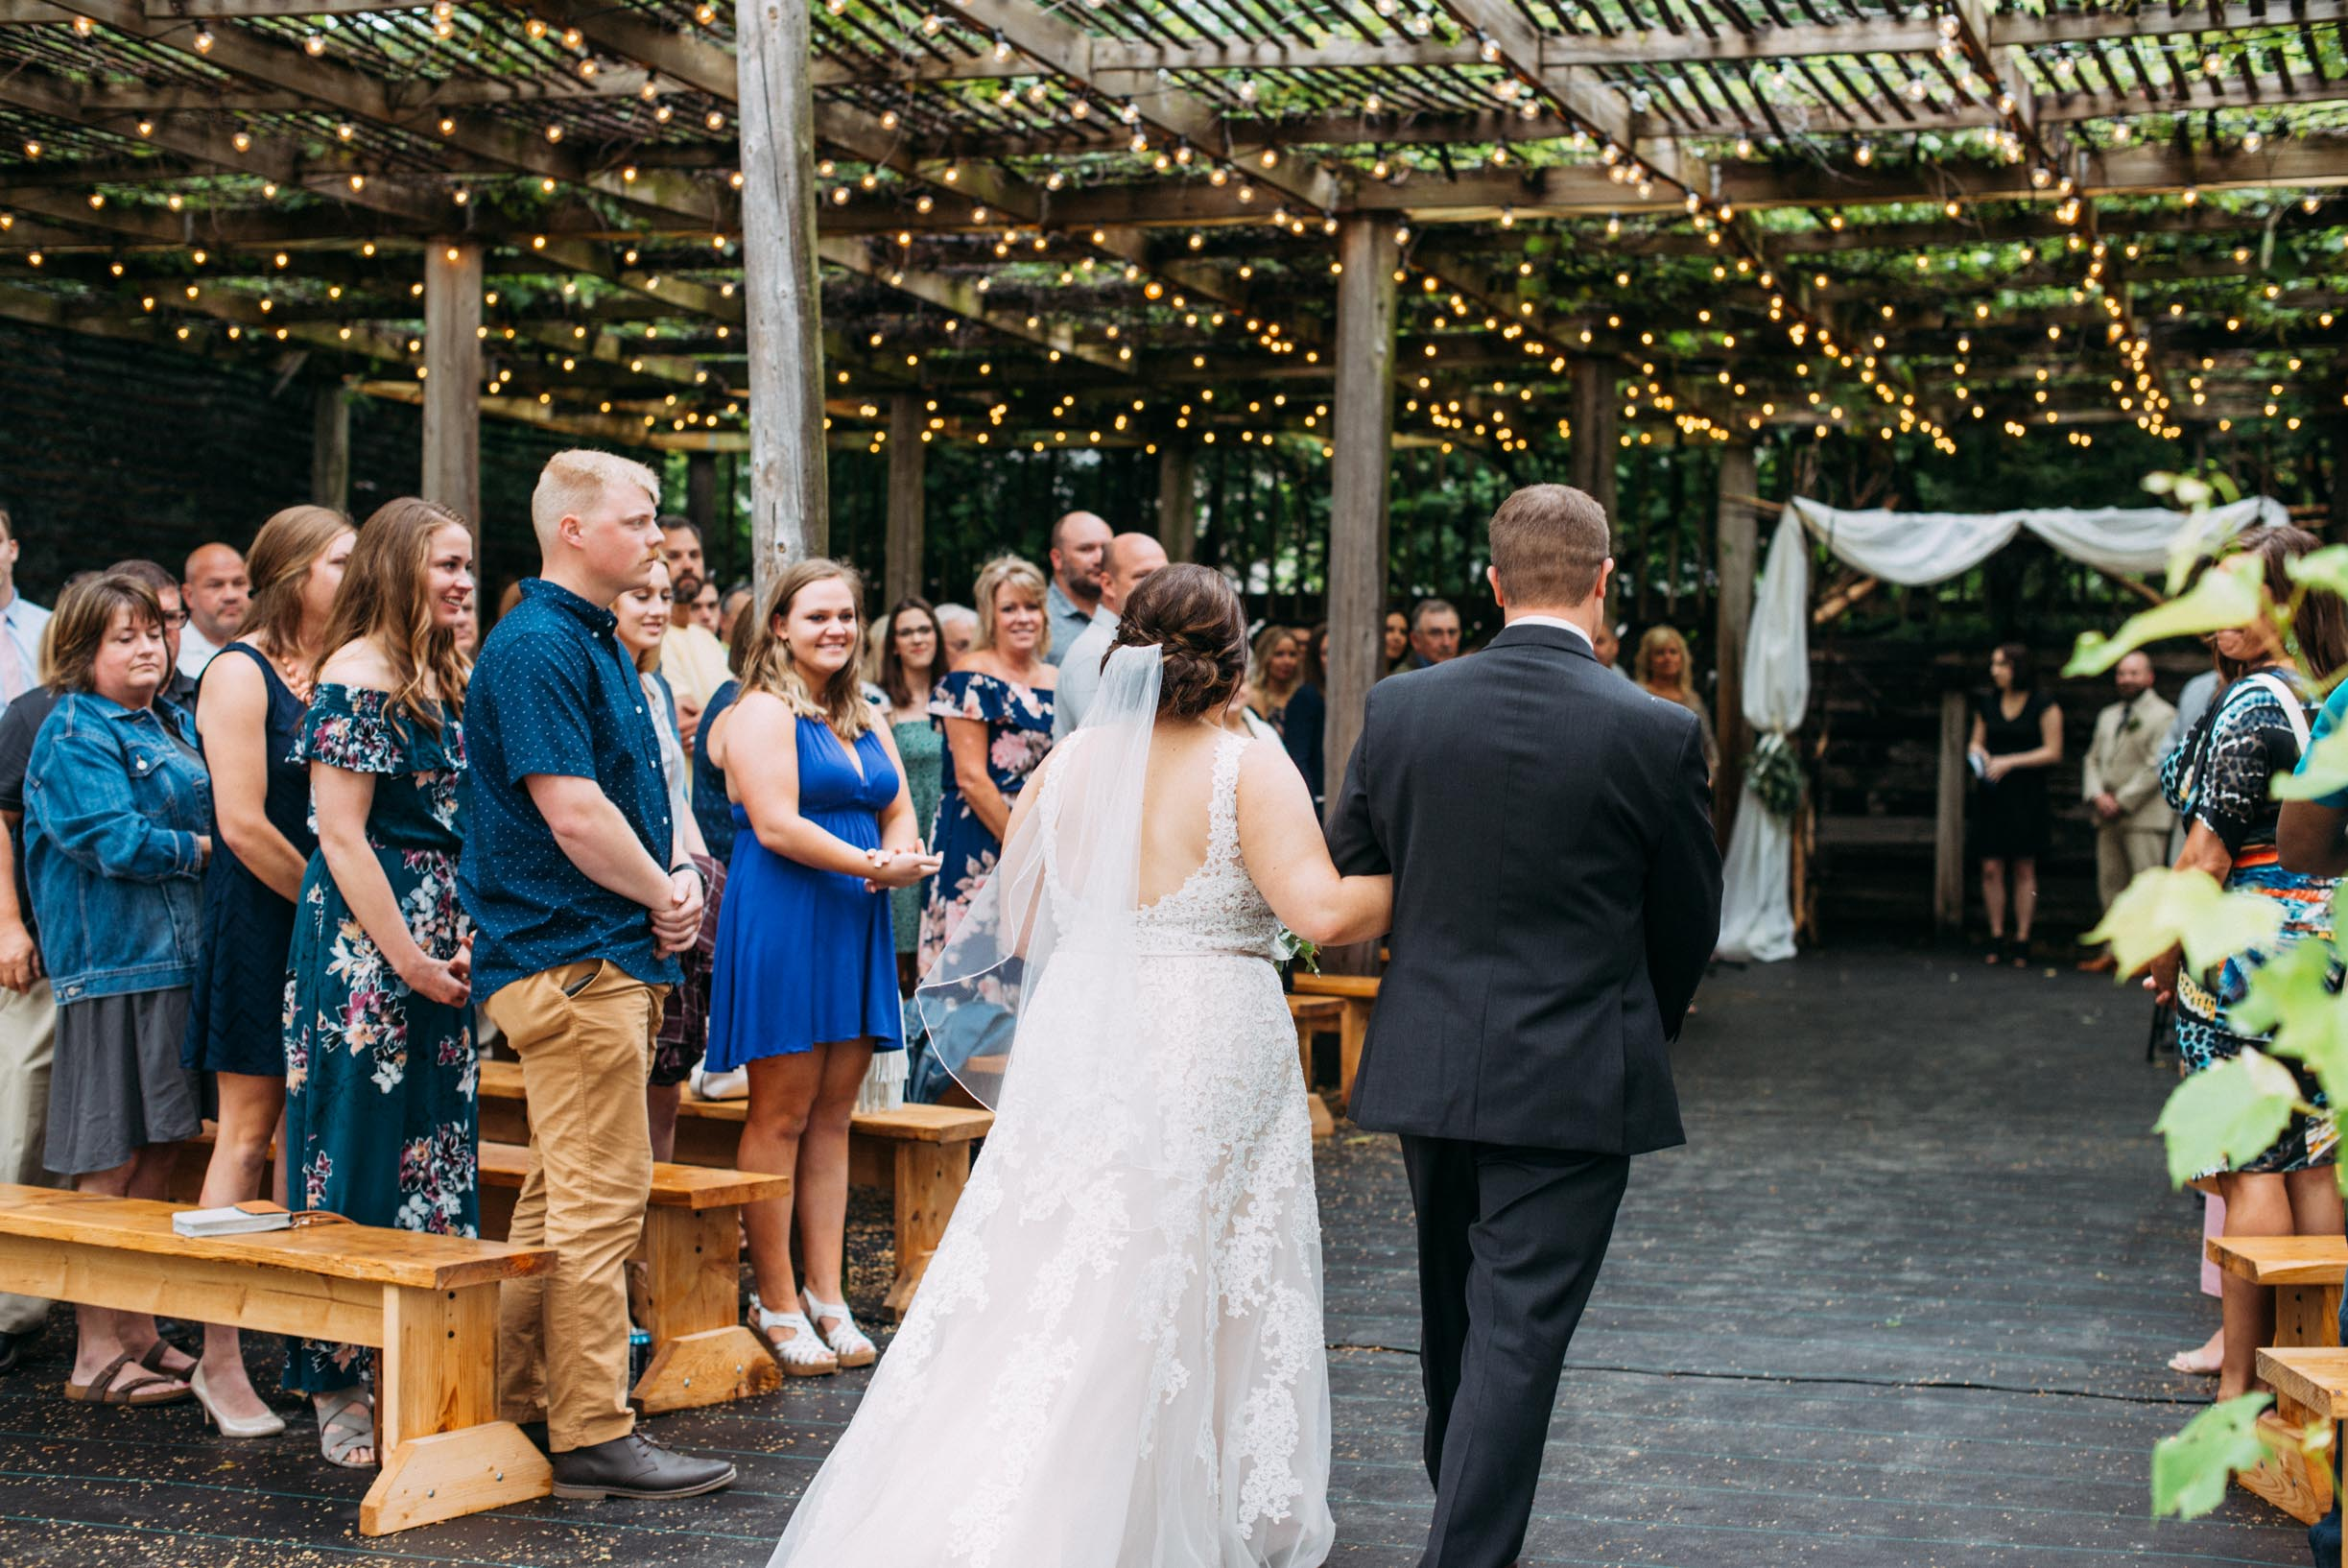 43-Jess_Jeremy_Minnesota_Wedding_Ceremony.jpg